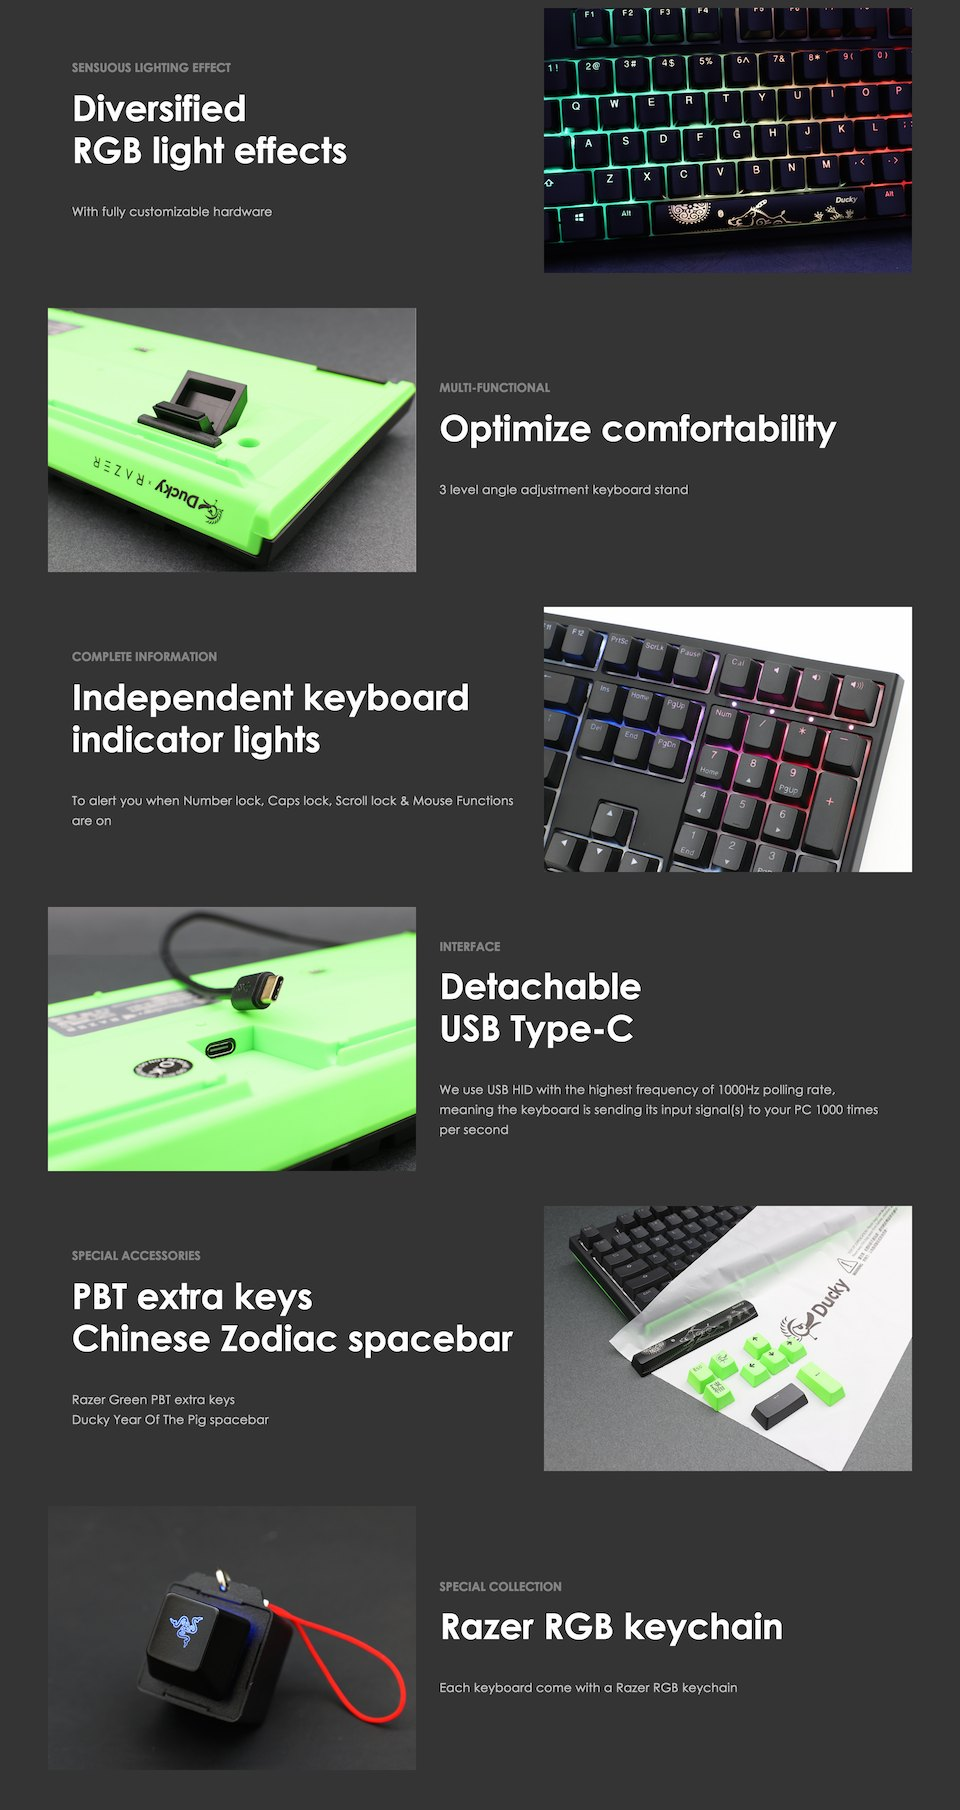 Ducky One 2 Razer Edition RGB Mechanical Keyboard Orange features 3